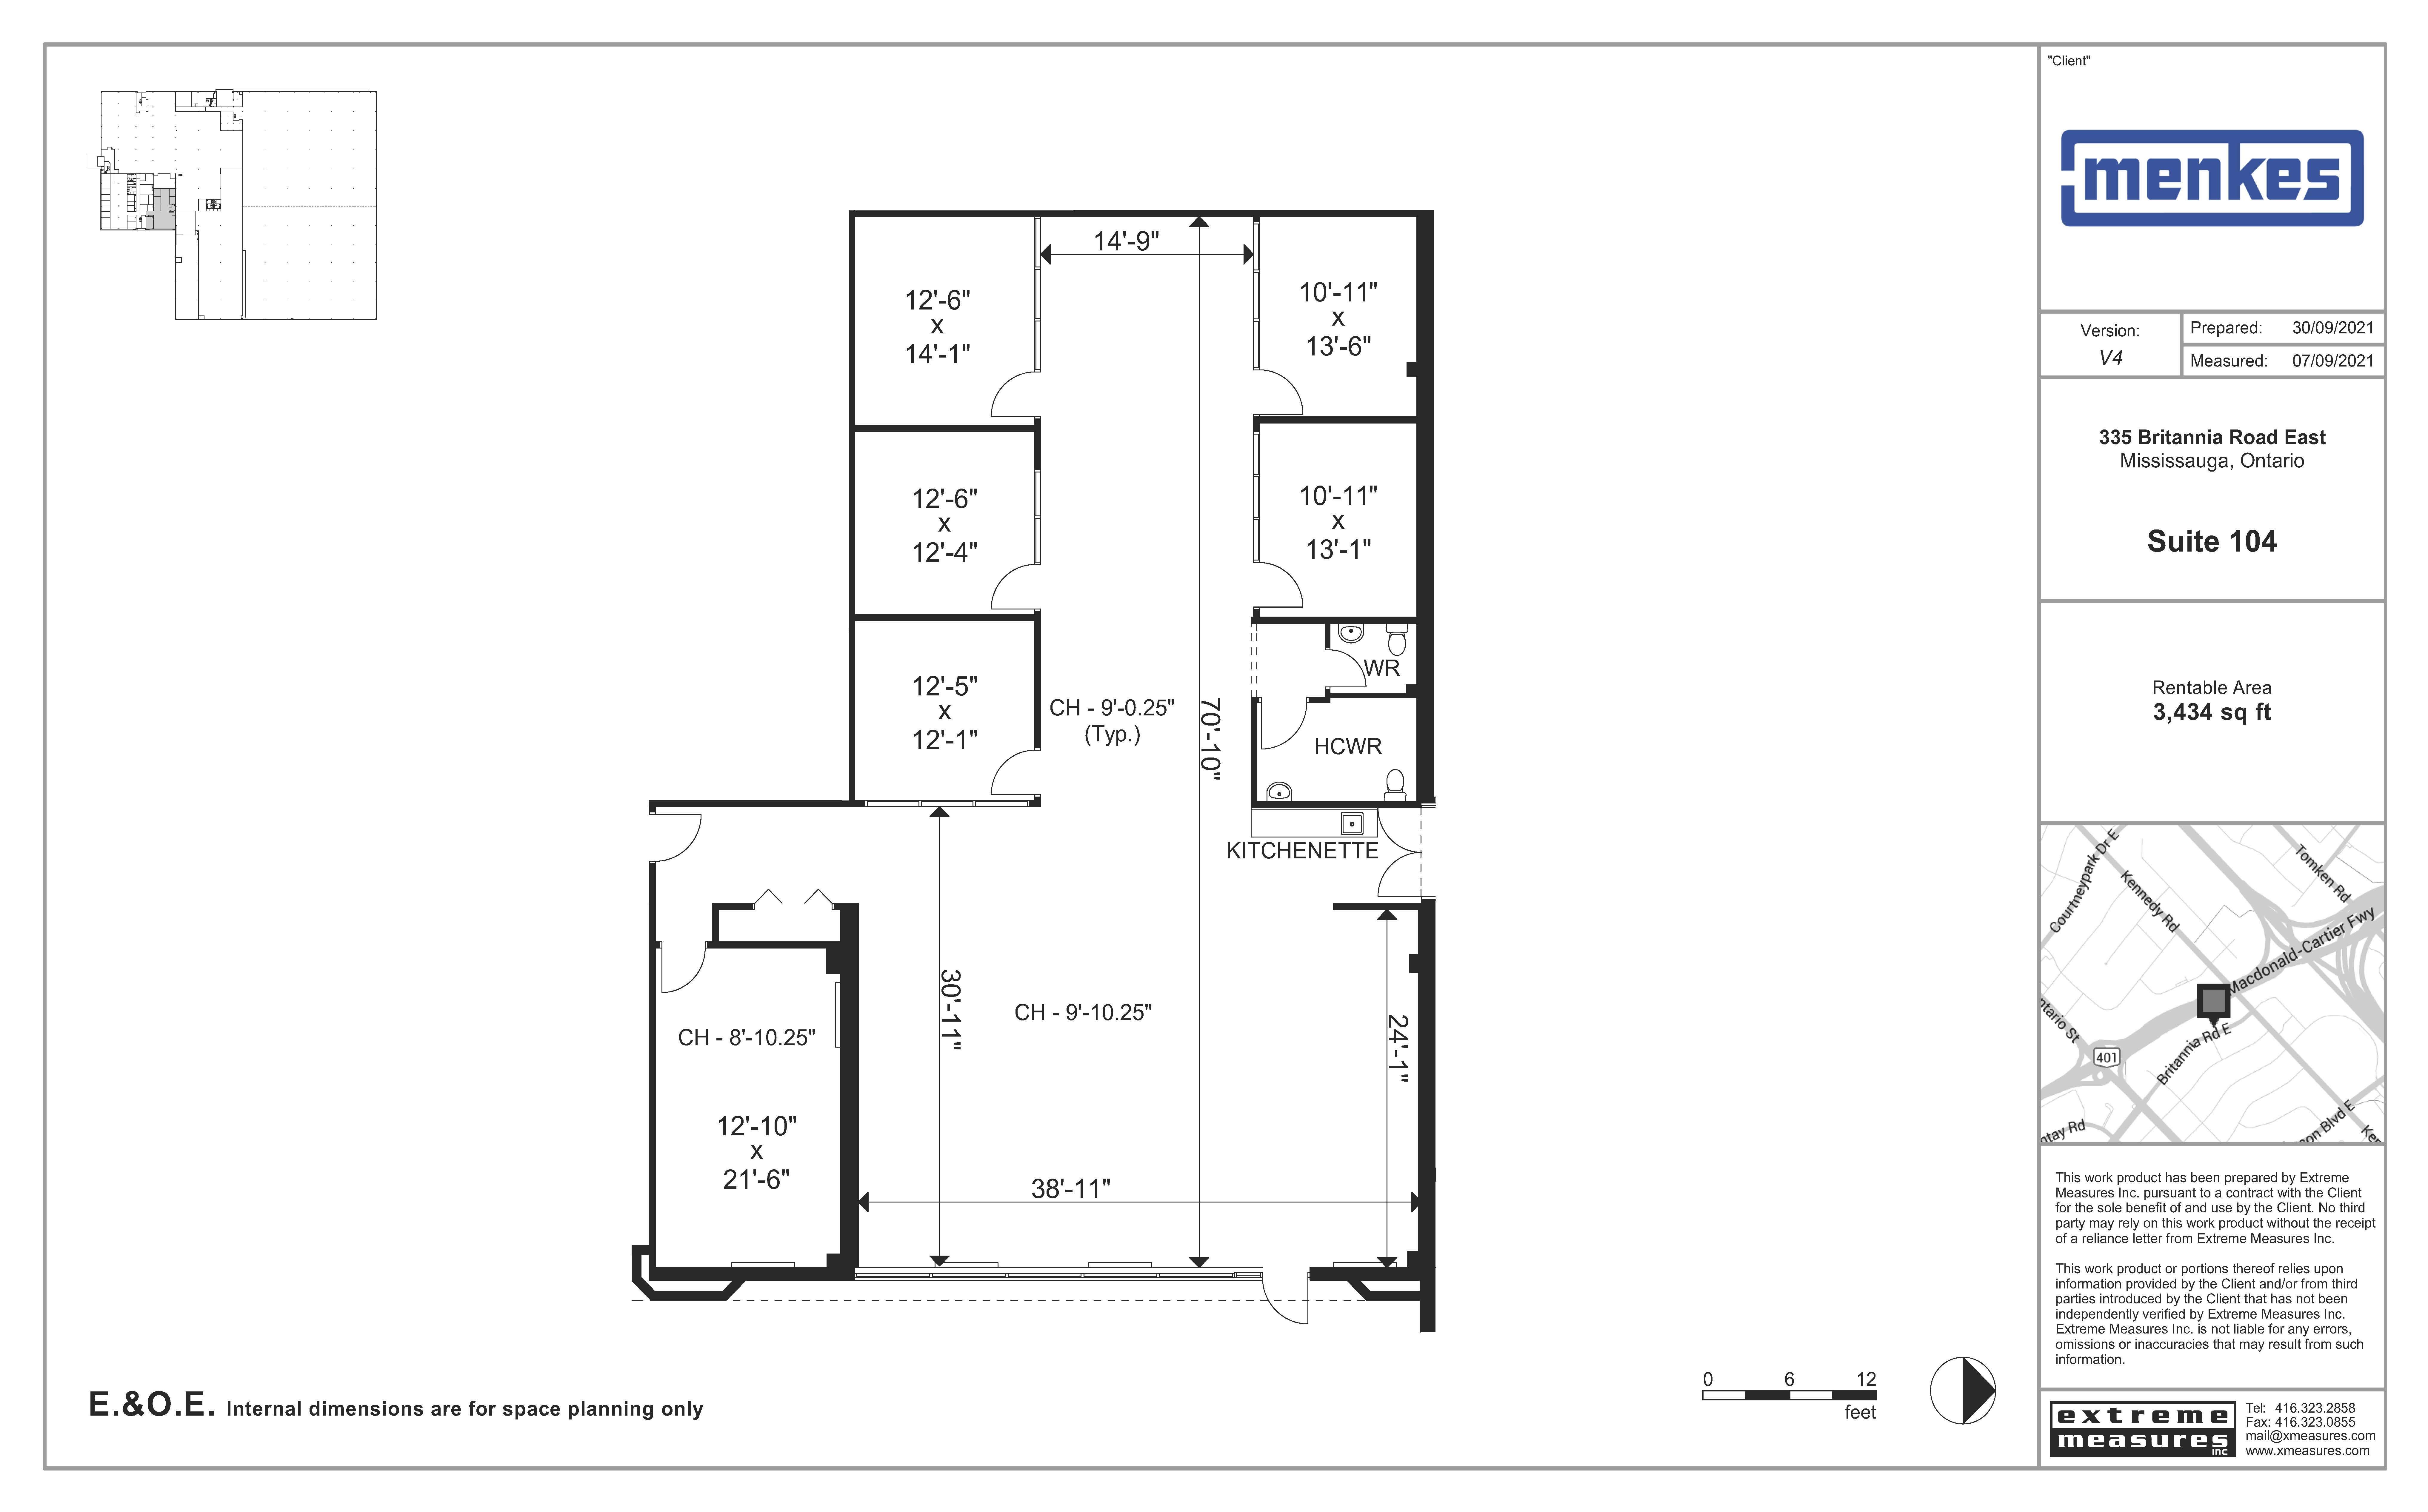 Floorplan thumbnail of Suite 104